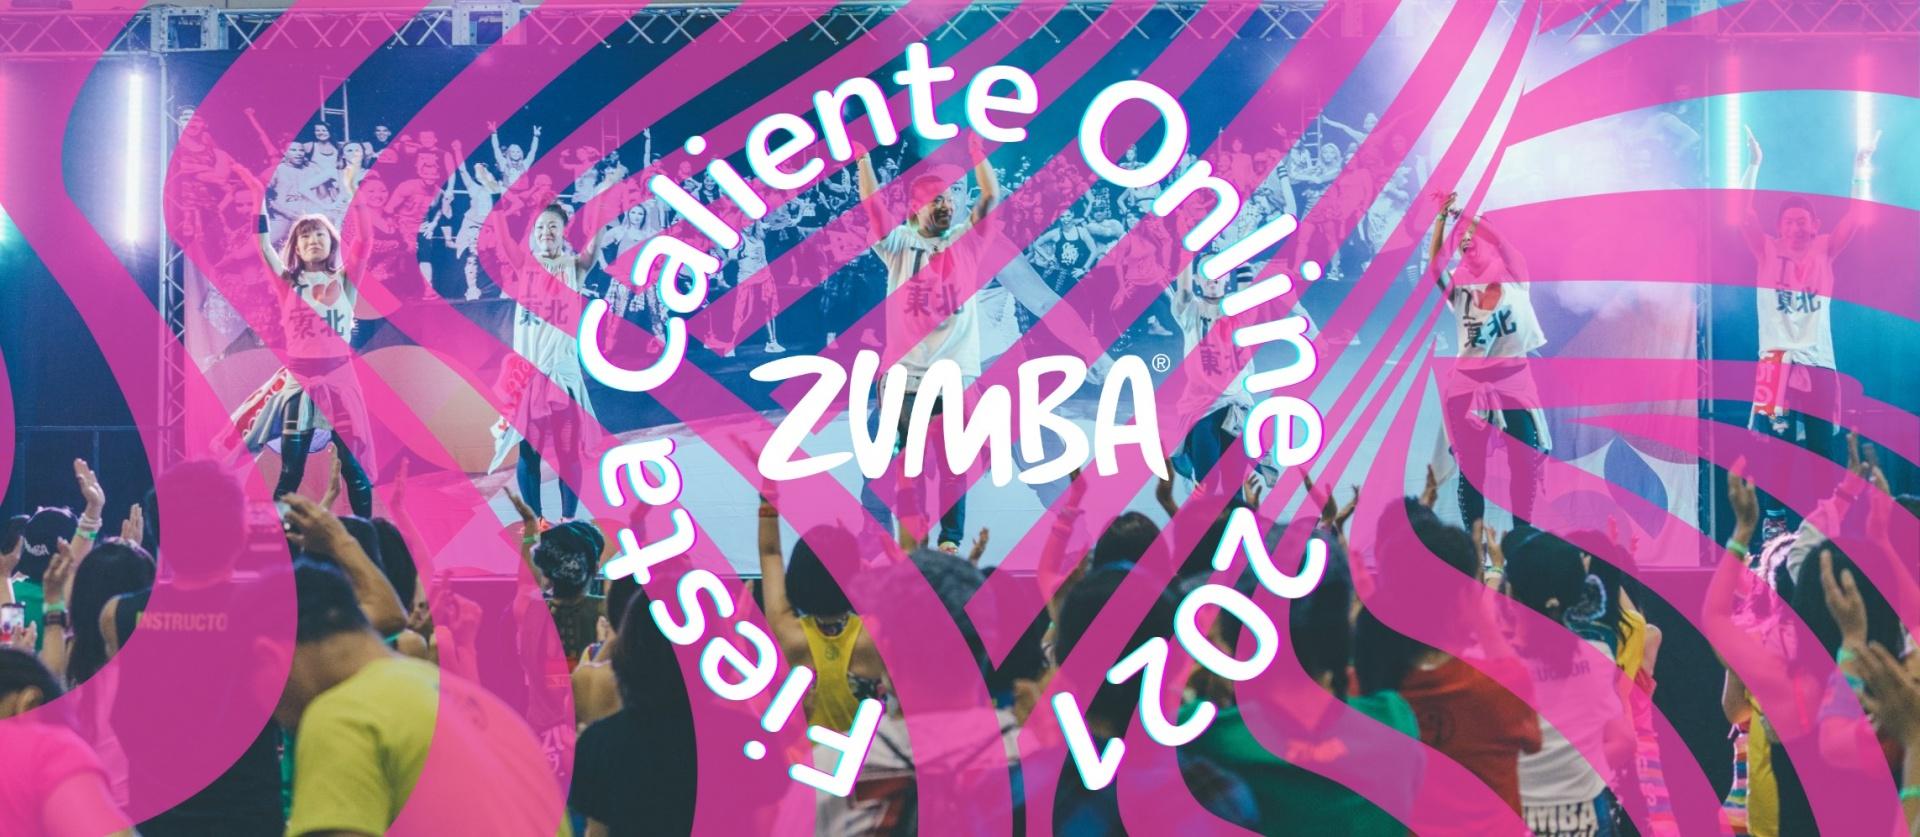 ZUMBA Fiesta Caliente Online